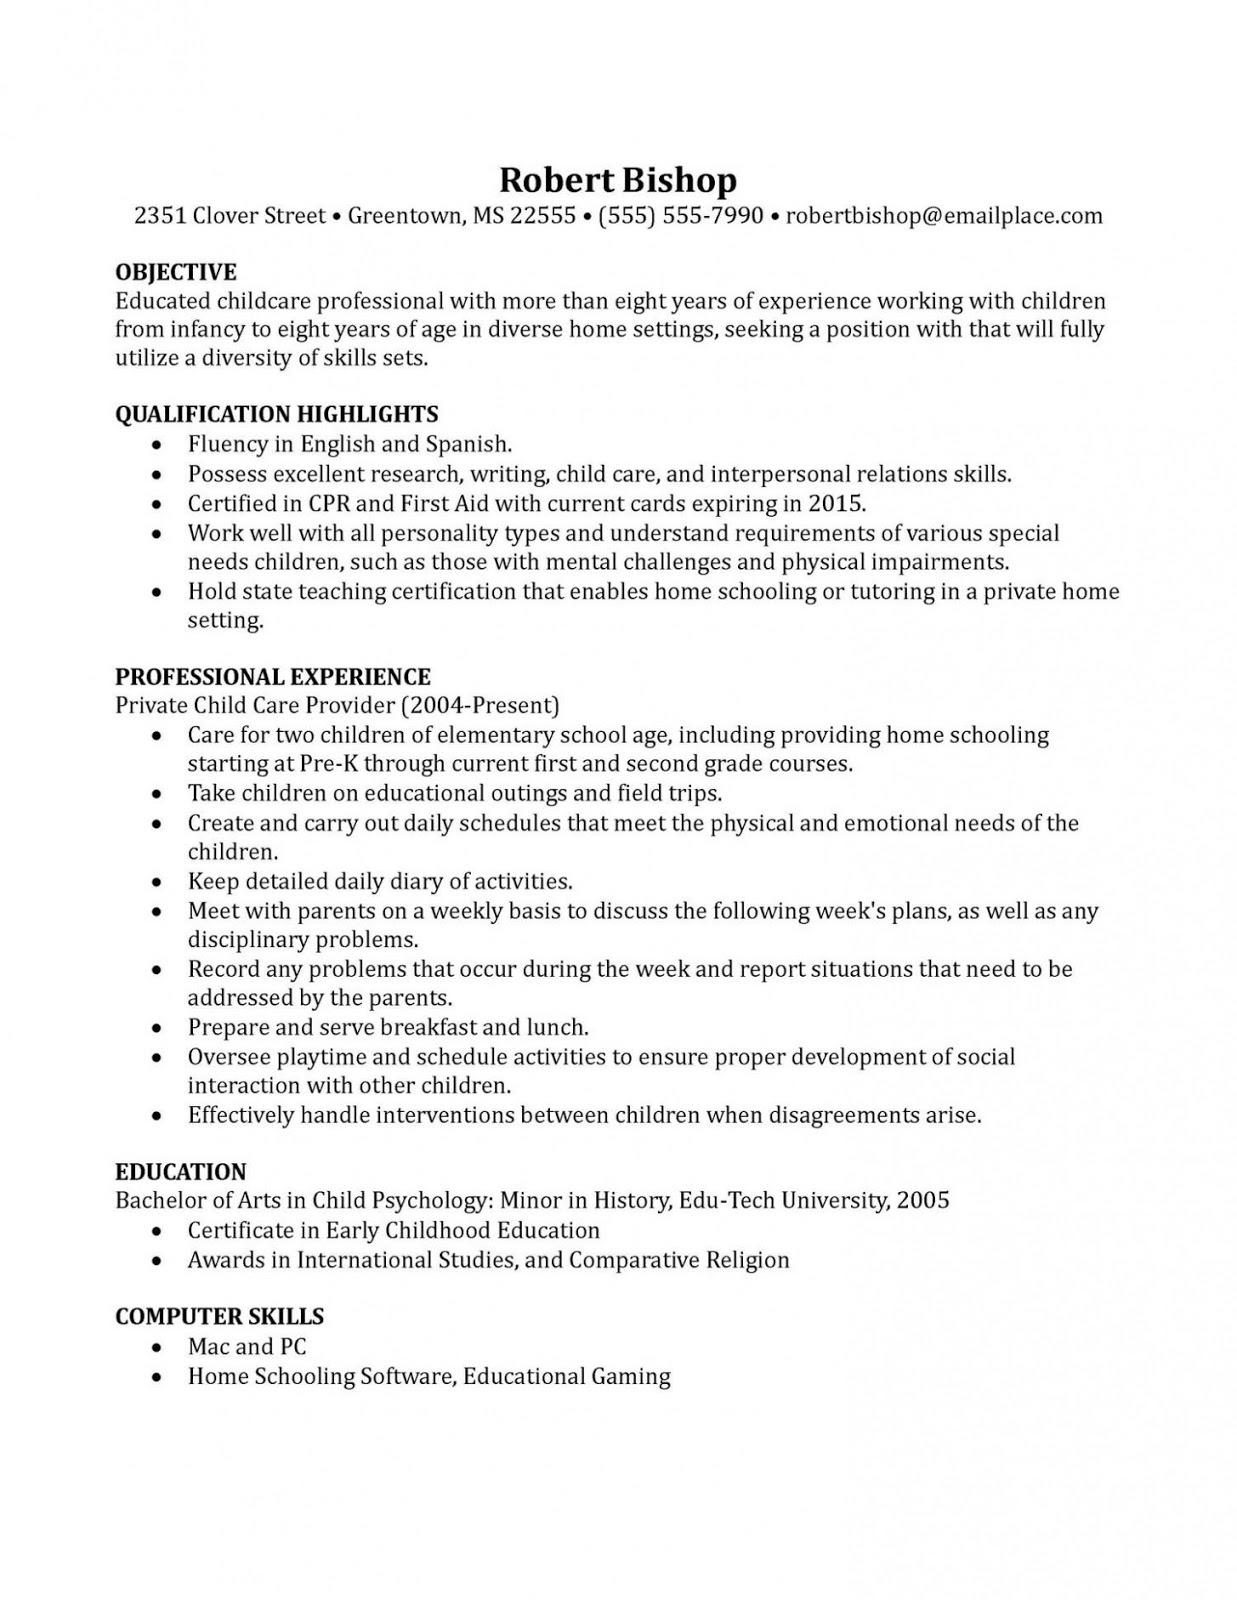 Nanny resume templates, nanny resume templates free 2019, nanny resume template download 2019,  nanny resume examples templates 2019 2020 , nanny resume examples free, nanny resume samples free,